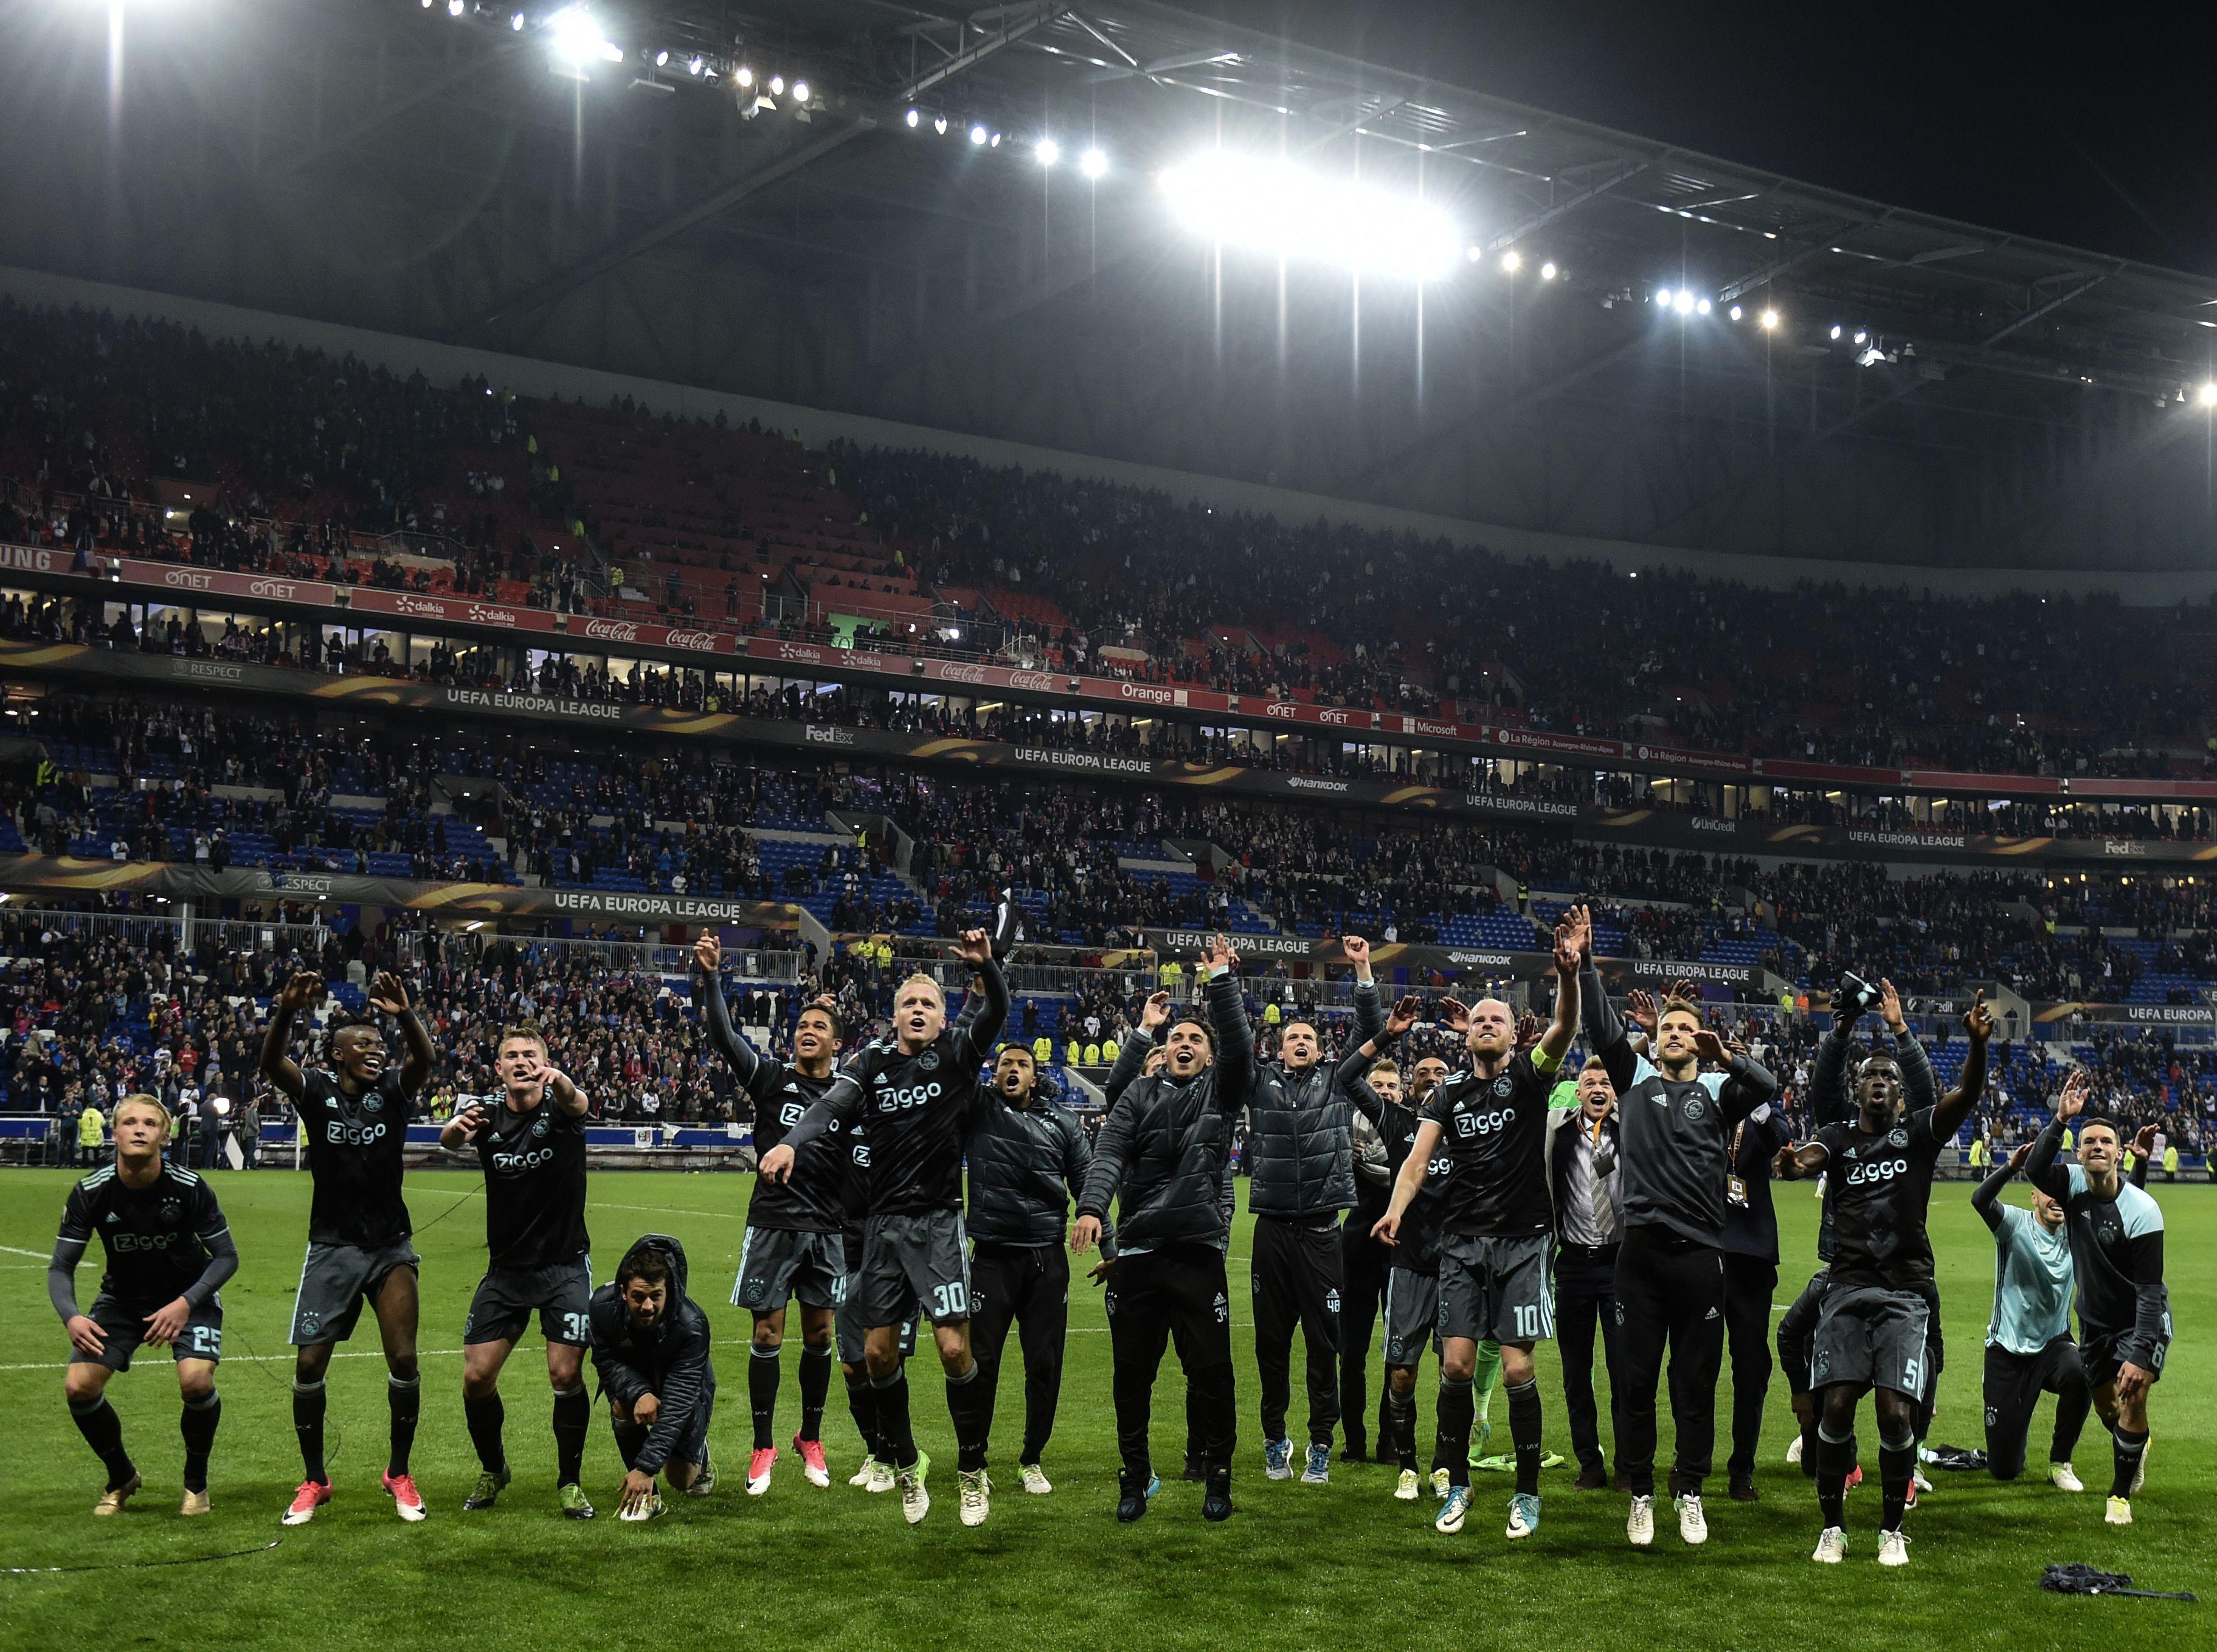 siegprämie europa league